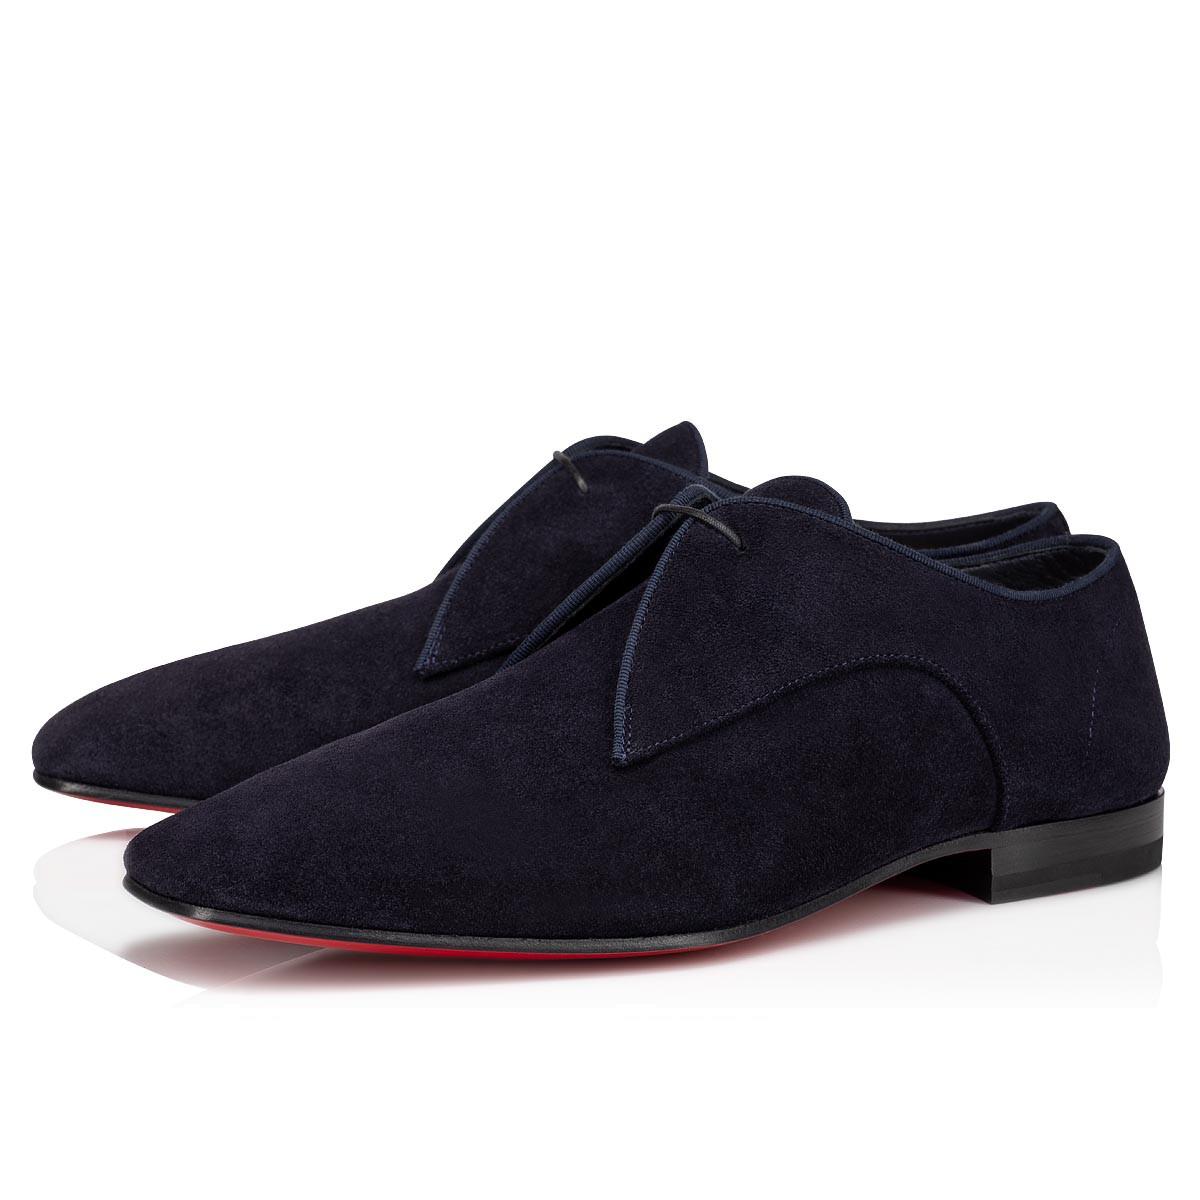 鞋履 - Carderby Flat Crosta Retournee - Christian Louboutin